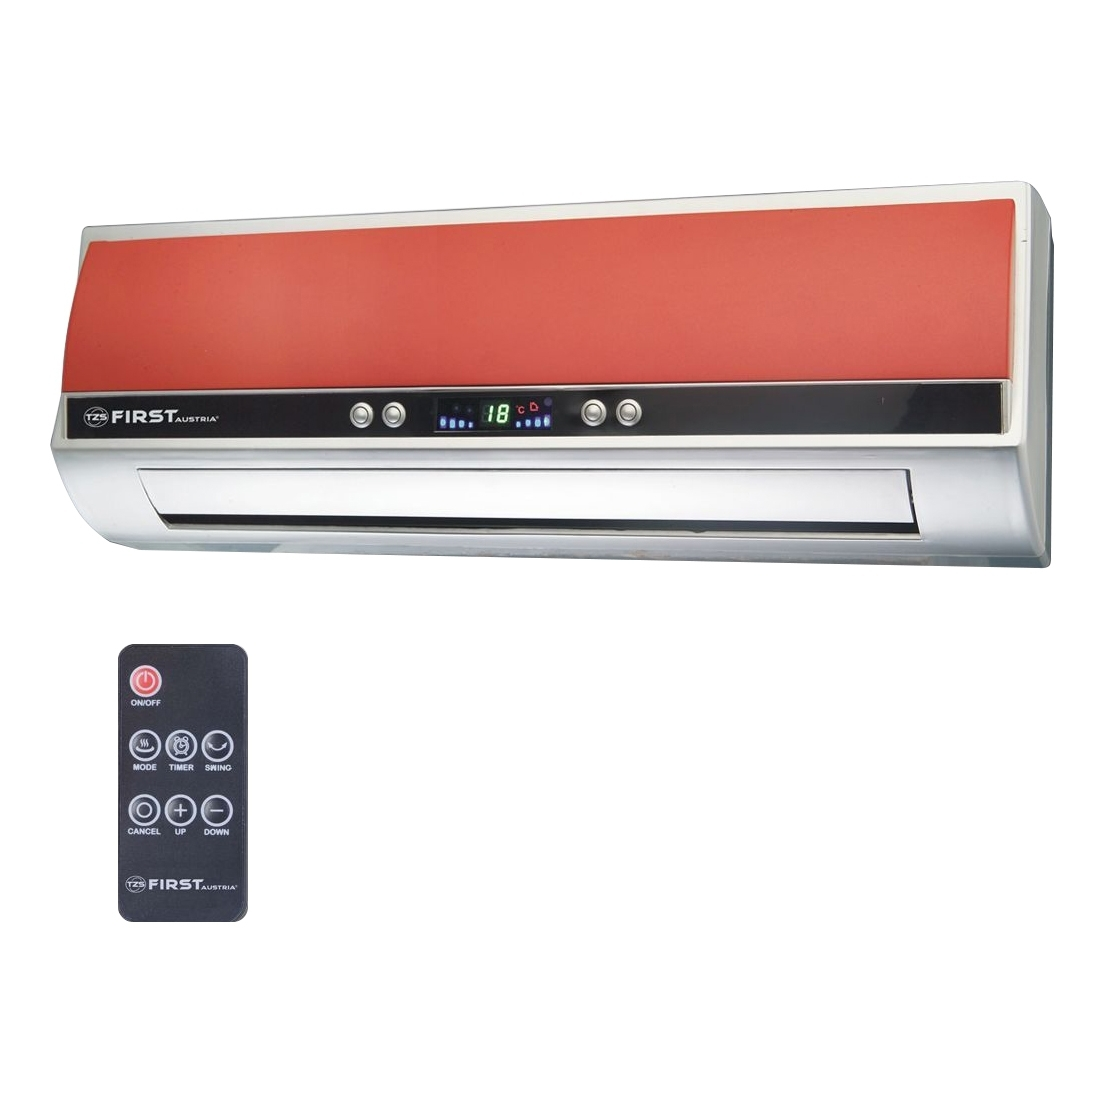 Fan heater FIRST FA-5571-8-RE тепловентилятор first fa 5571 8 re 2000 вт красный